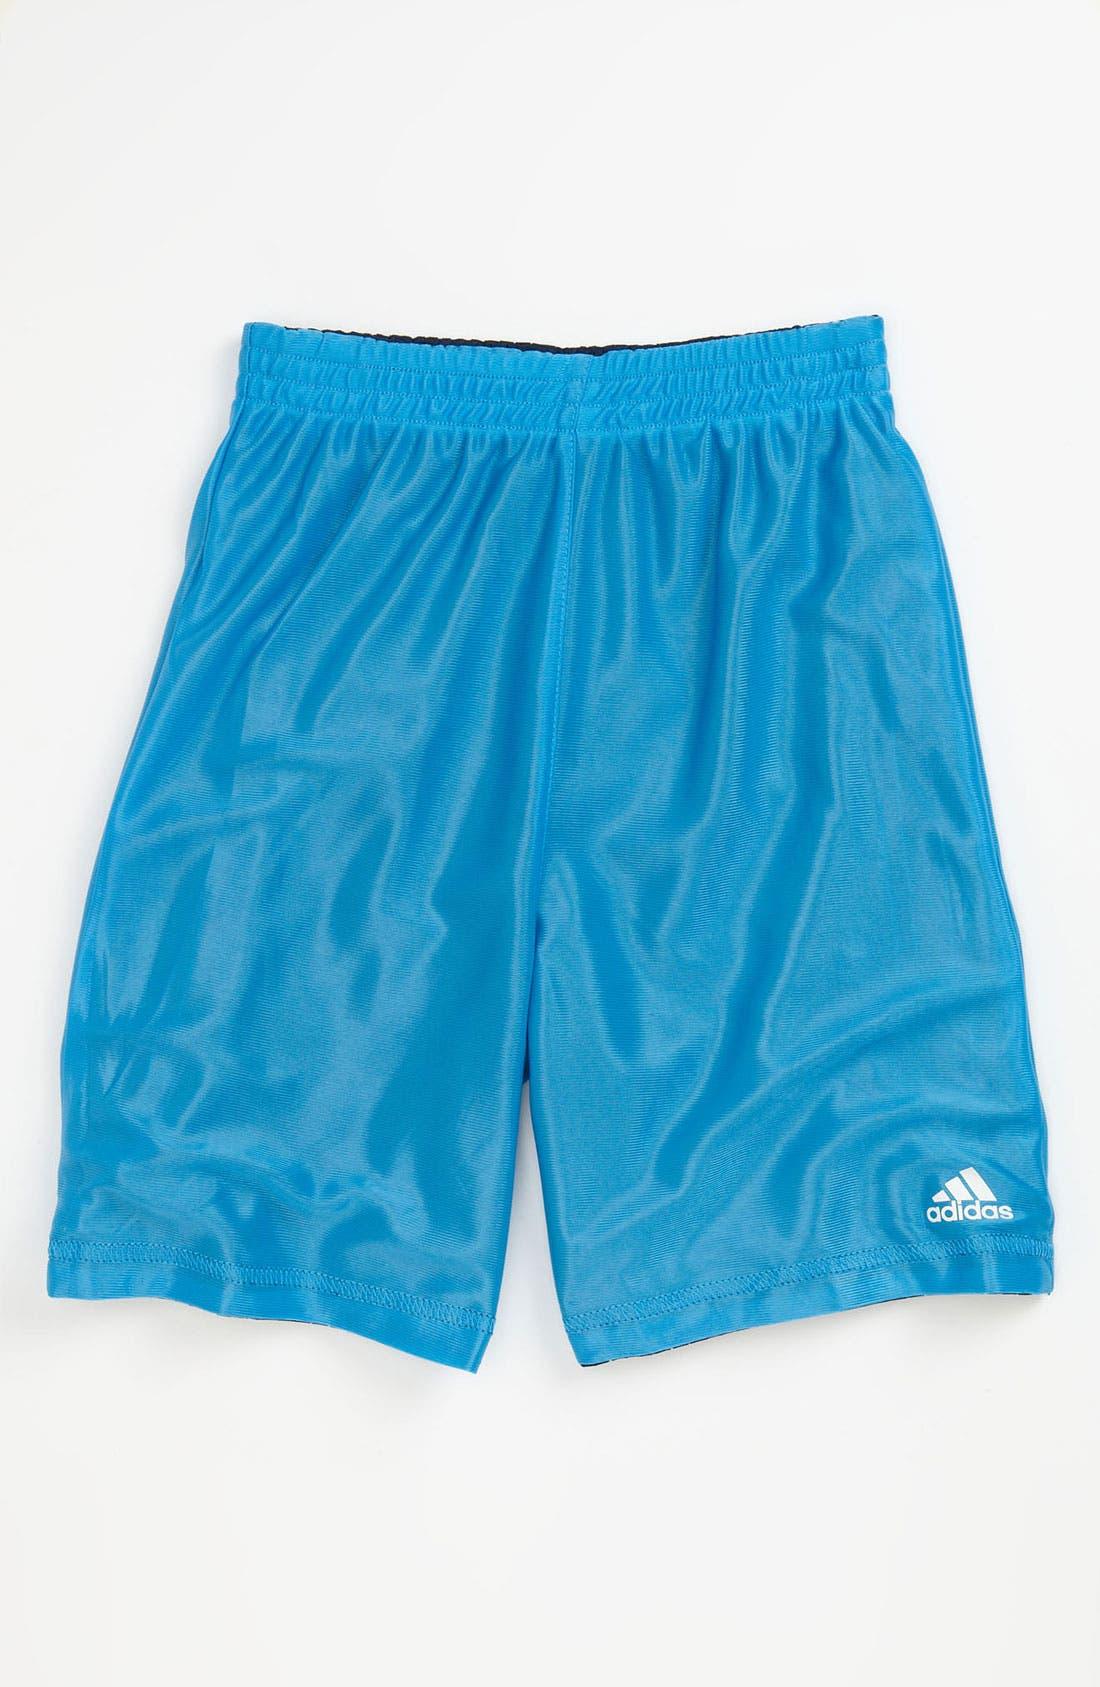 Alternate Image 2  - adidas 'Flip Side' Reversible Shorts (Little Boys)